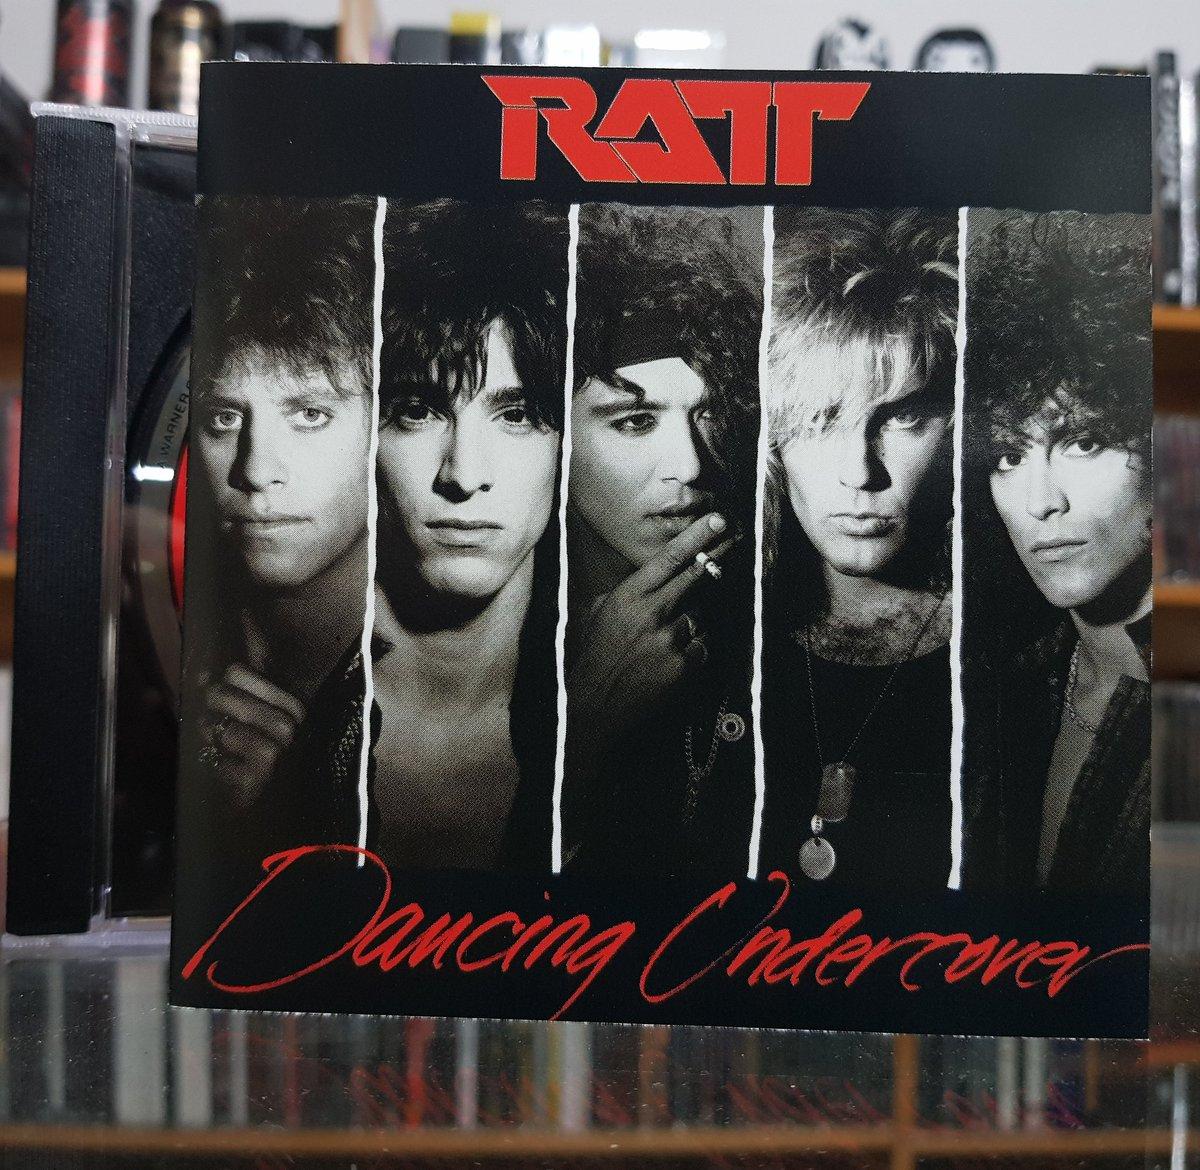 #30Days1Album3Songs Day 5 @theRATTpack  Ratt – Dancing Undercover (1986)  1. Dance 2. Slip of the Lip 3. Body Talk  #Ratt #DancingUndercover #StephenPearcy #WarrenDeMartini #RobbinCrosby #JuanCroucier #BobbyBlotzerr #RattnRoll #hardrock #hairmetal #glammetal